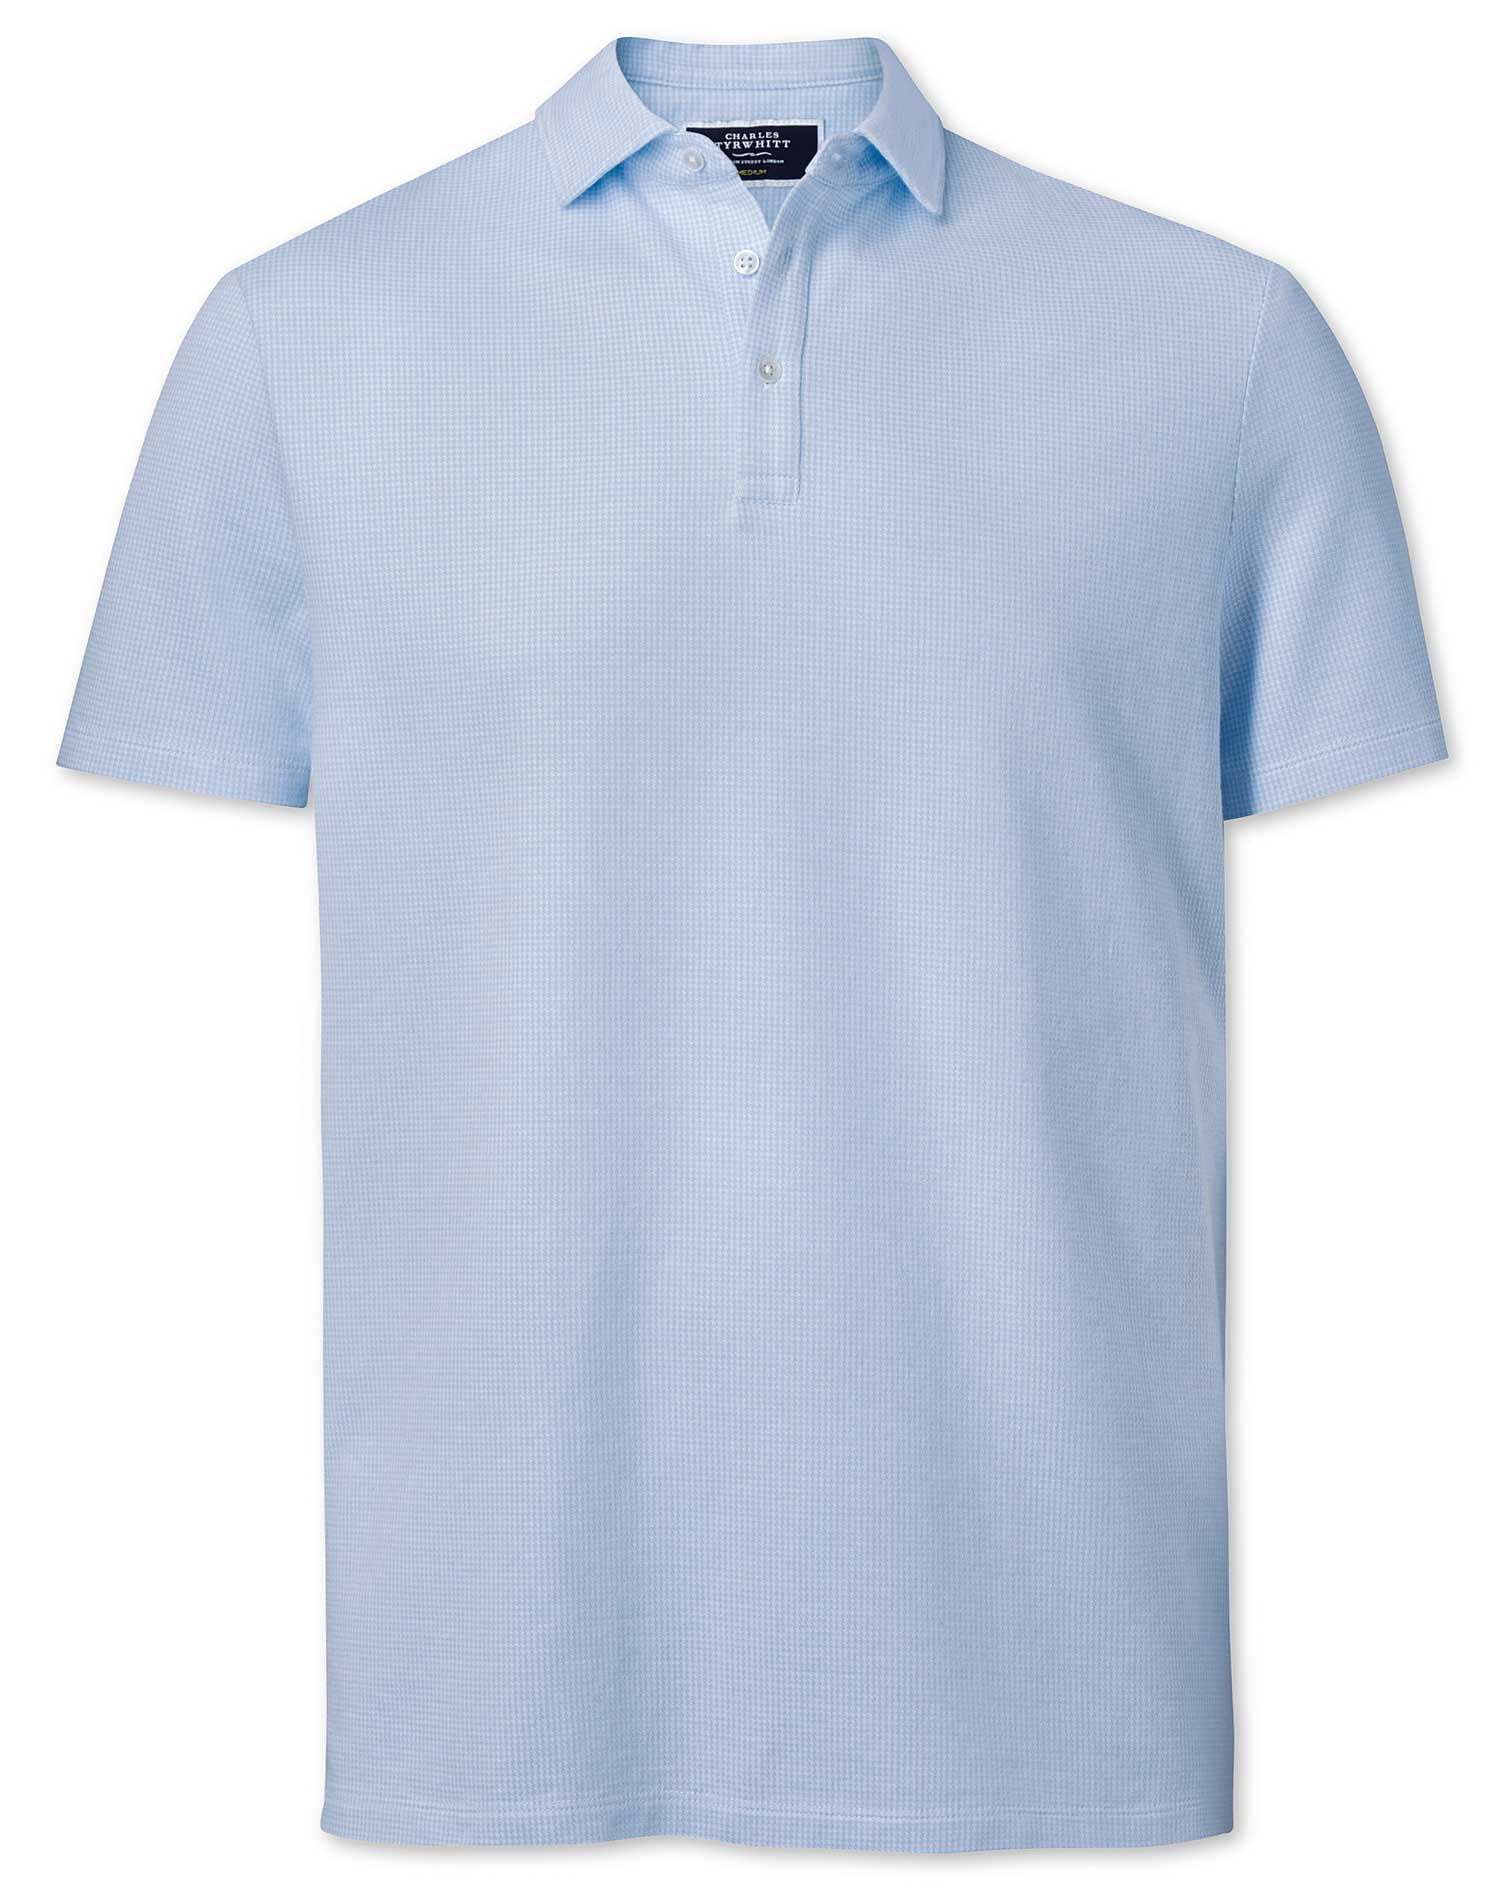 Sky Blue Puppytooth Textured Cotton Polo Size XXXL by Charles Tyrwhitt